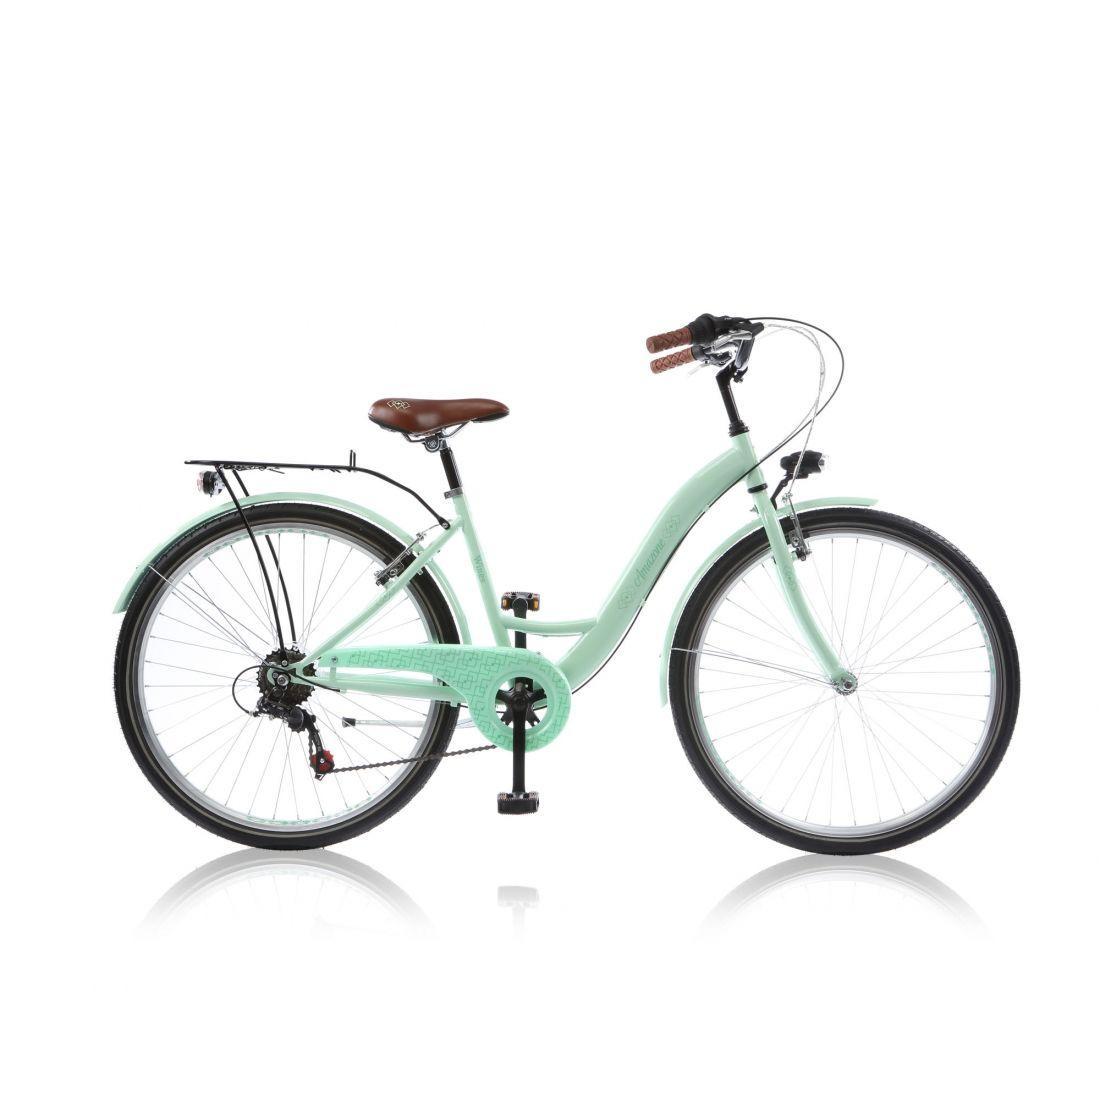 citybike enfant amazone 20 6 vitesses vert clair